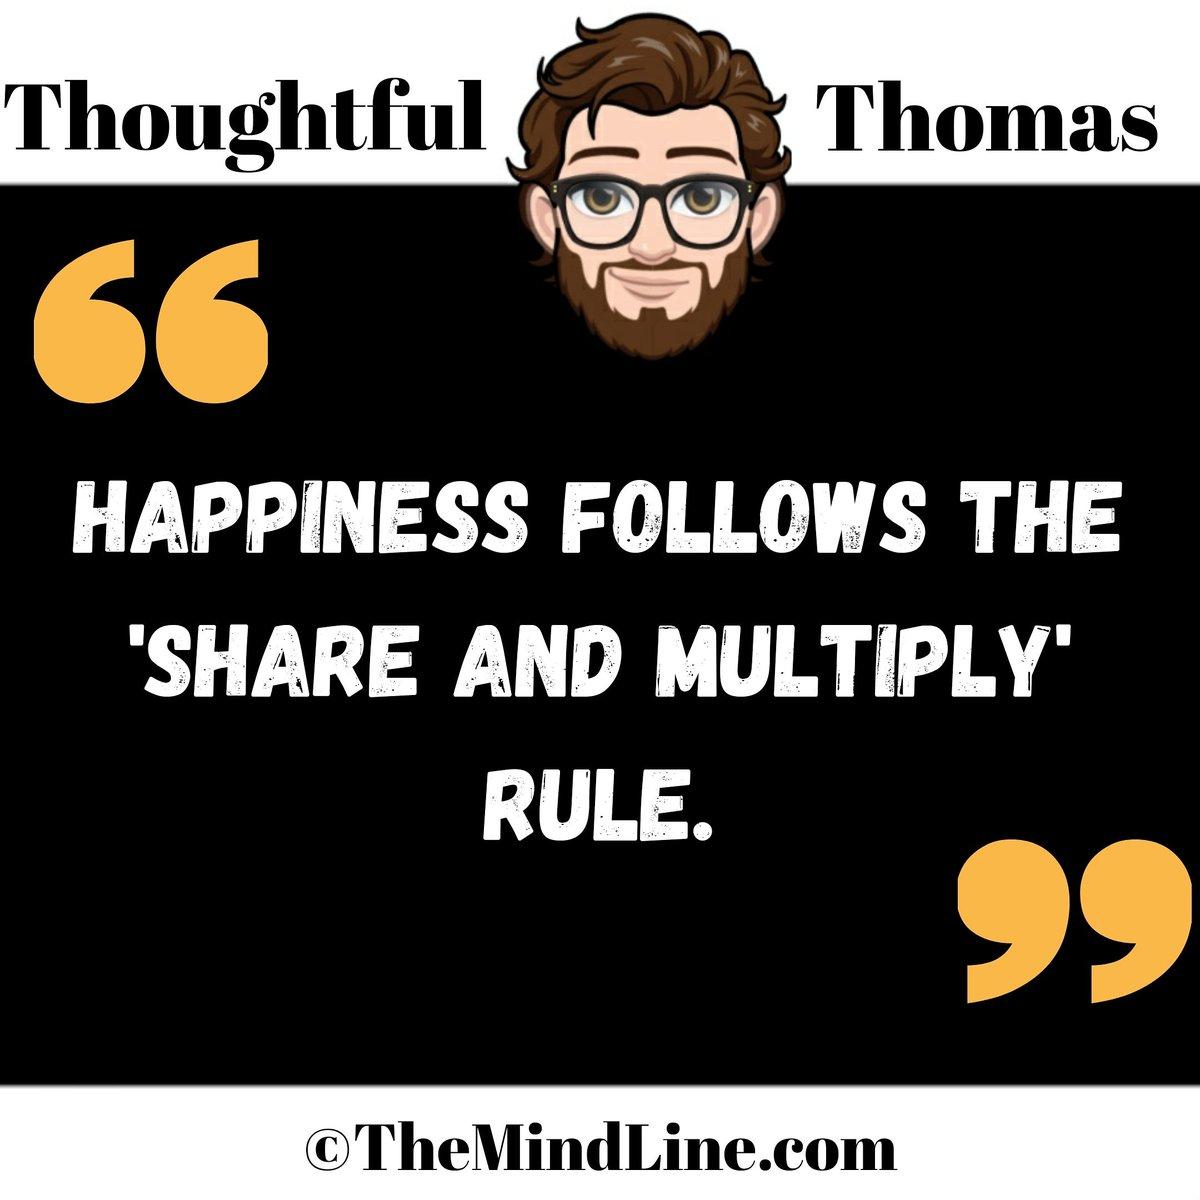 Thoughtful Thomas  #thoughtfulthomas #themindline #youth #Students #artistsofinstagram #poetry #happinessiseverything #happinessquotes #happiness #thoughtoftheday #thoughtfortheday #wednesdaywisdom #wednesday #wednesdayvibes #wednesdaymotivation #wednesdaymood https://t.co/8ZlIcyVwfr